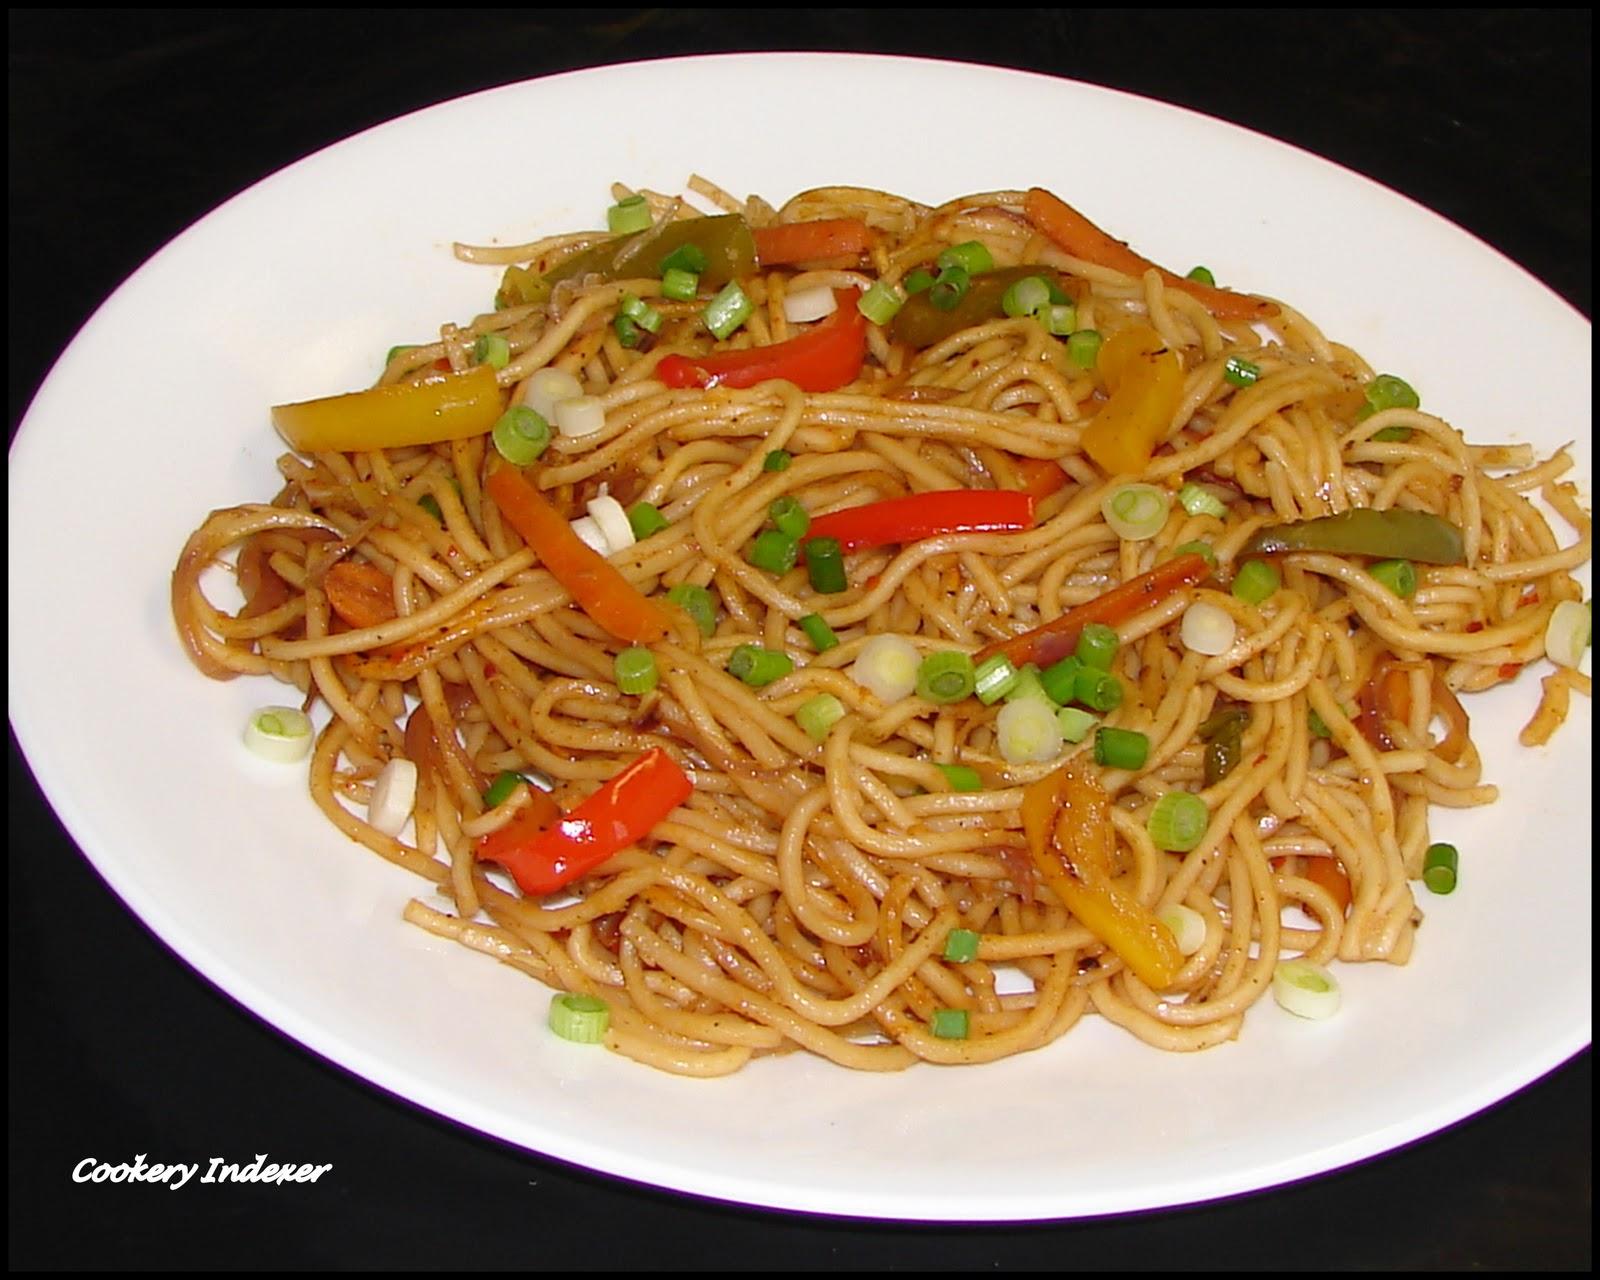 Regional indian cuisine blogroll vegetable hakka noodles indo vegetable hakka noodles indo chinese style forumfinder Choice Image